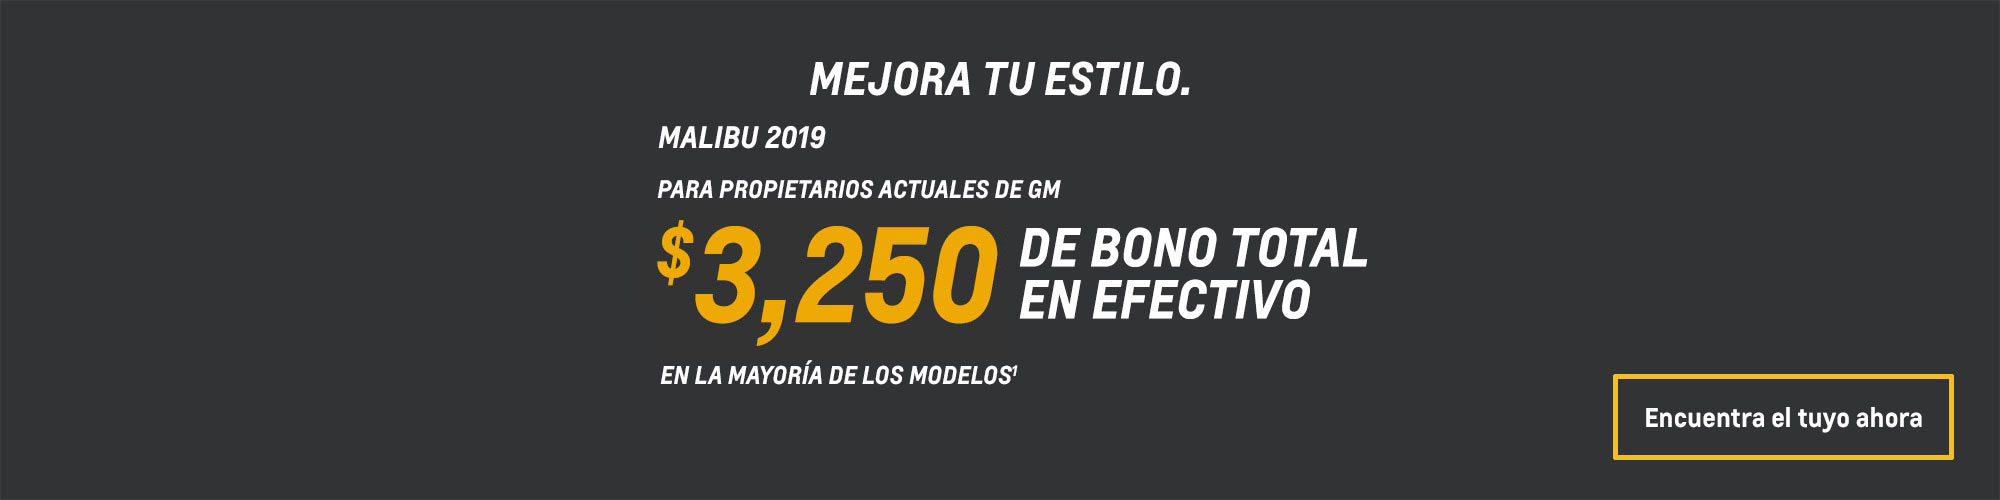 Malibu 2019: $3,250 Bono total en efectivo